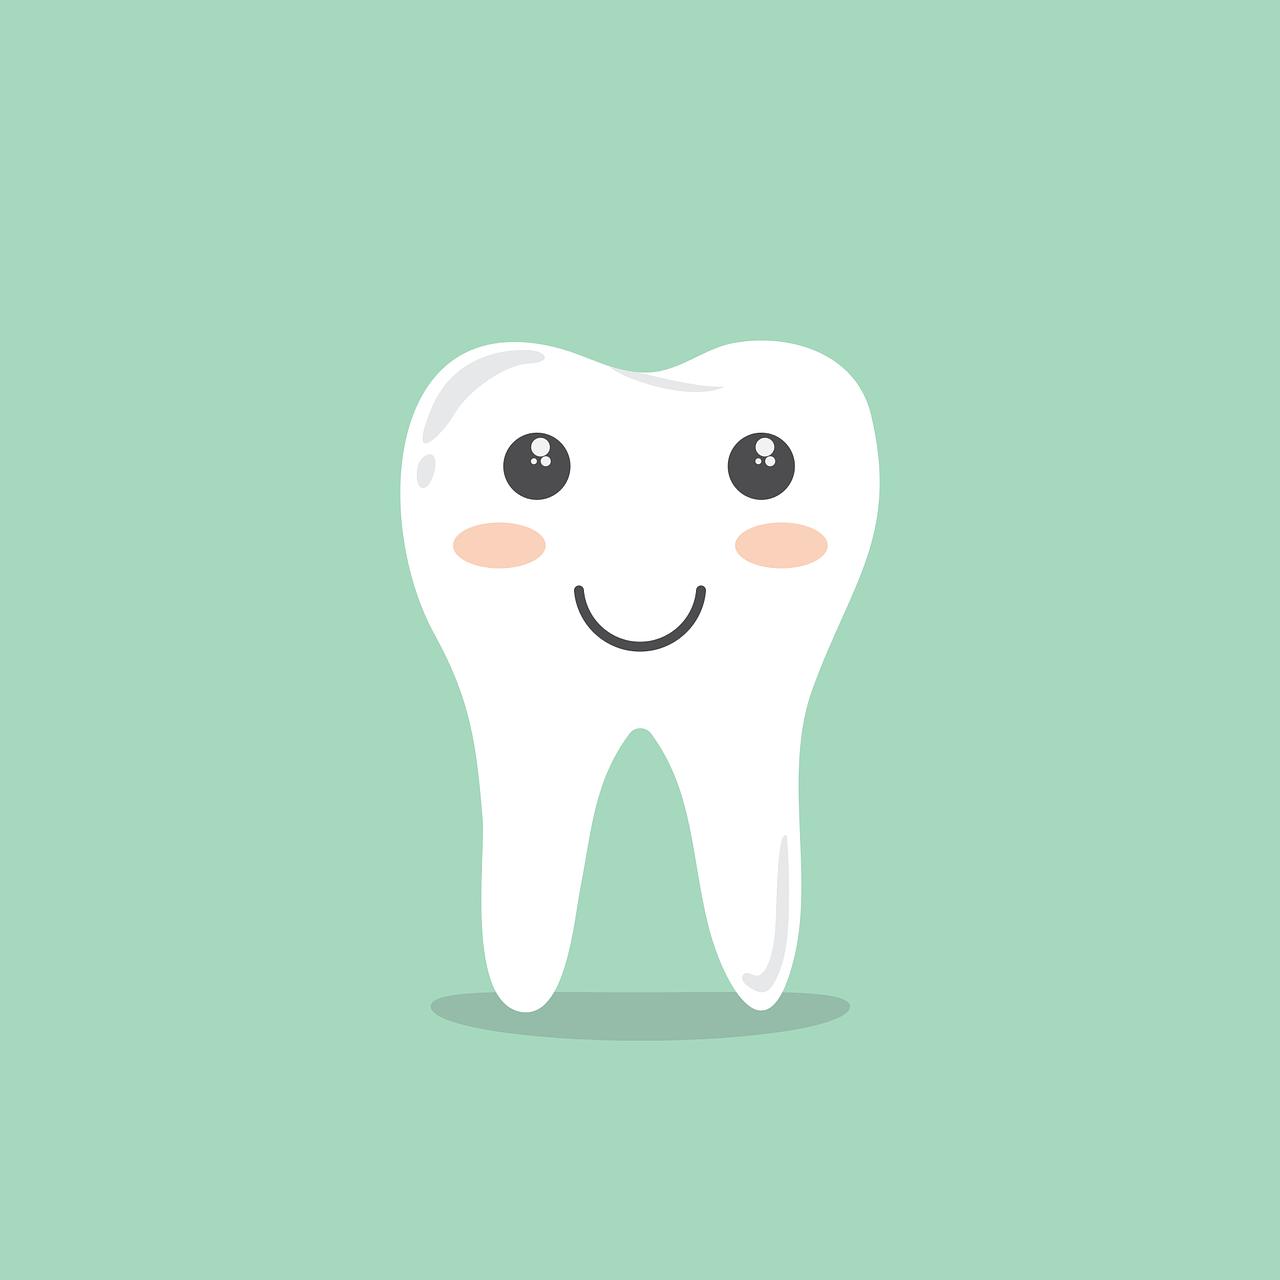 Teeth Cartoon Hygiene Cleaning  - LoveYouAll / Pixabay